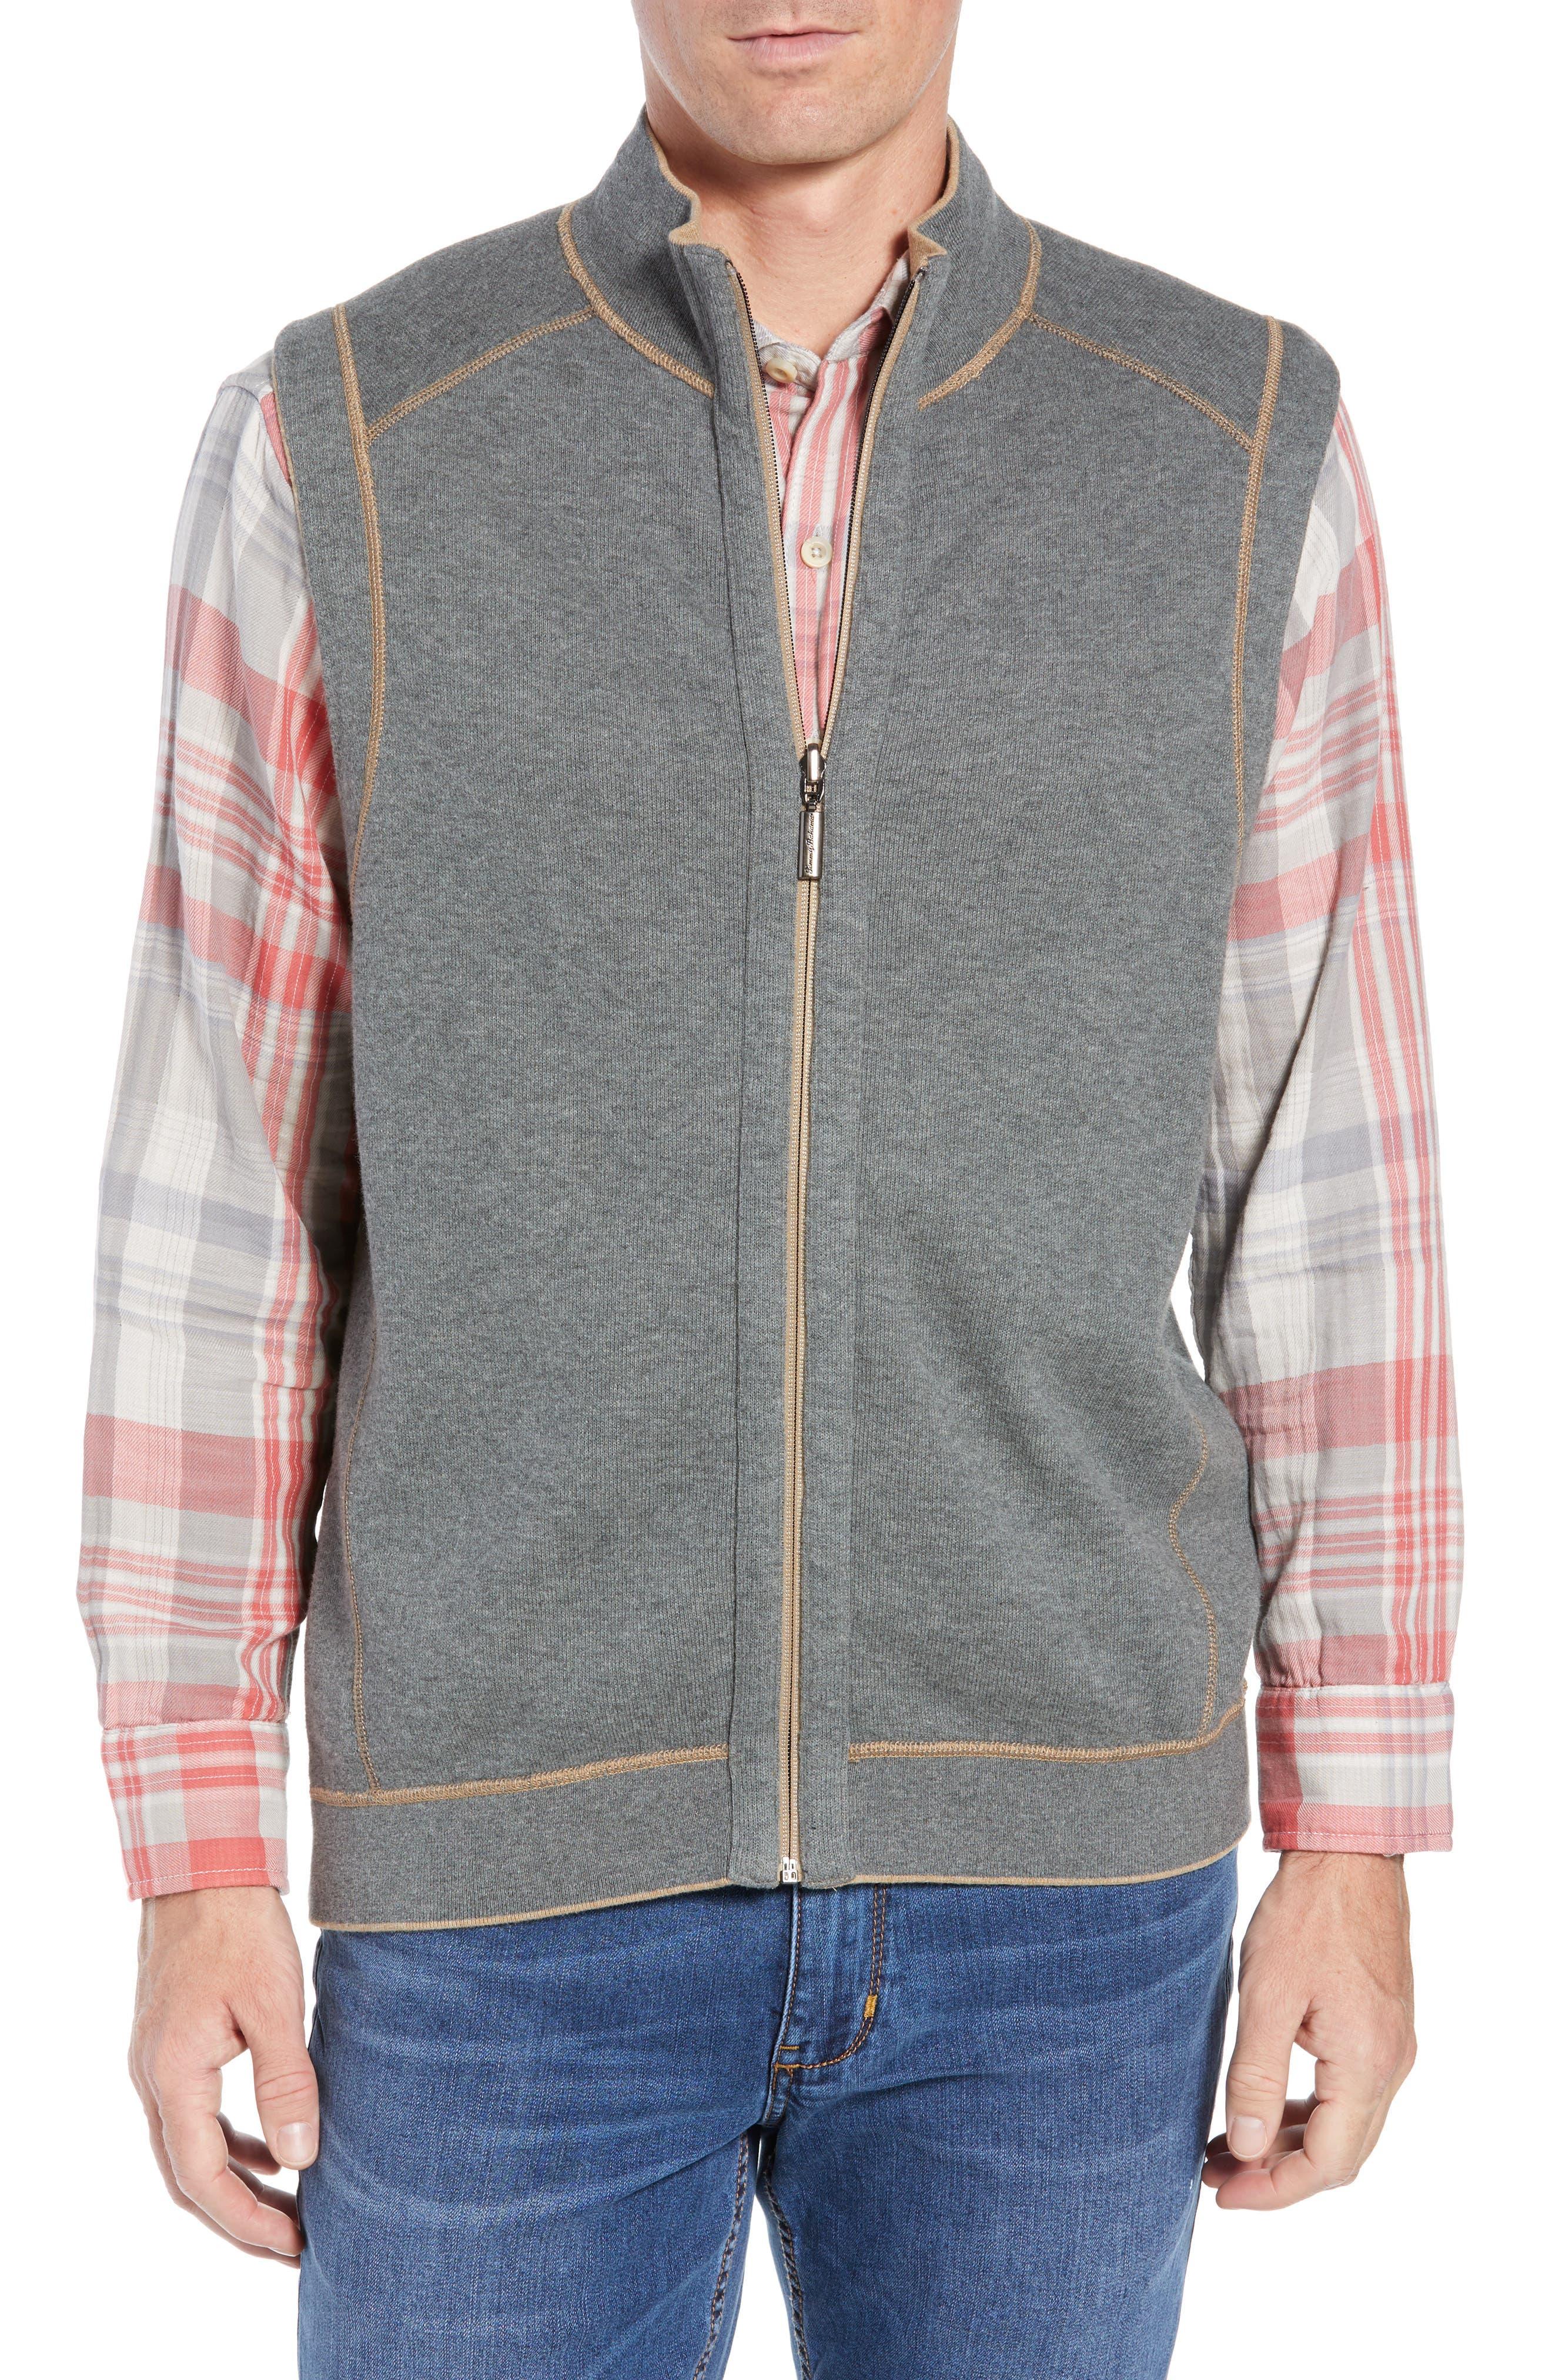 Flip Side Reversible Zip Vest,                             Alternate thumbnail 2, color,                             GOLDEN HONEY HEATHER